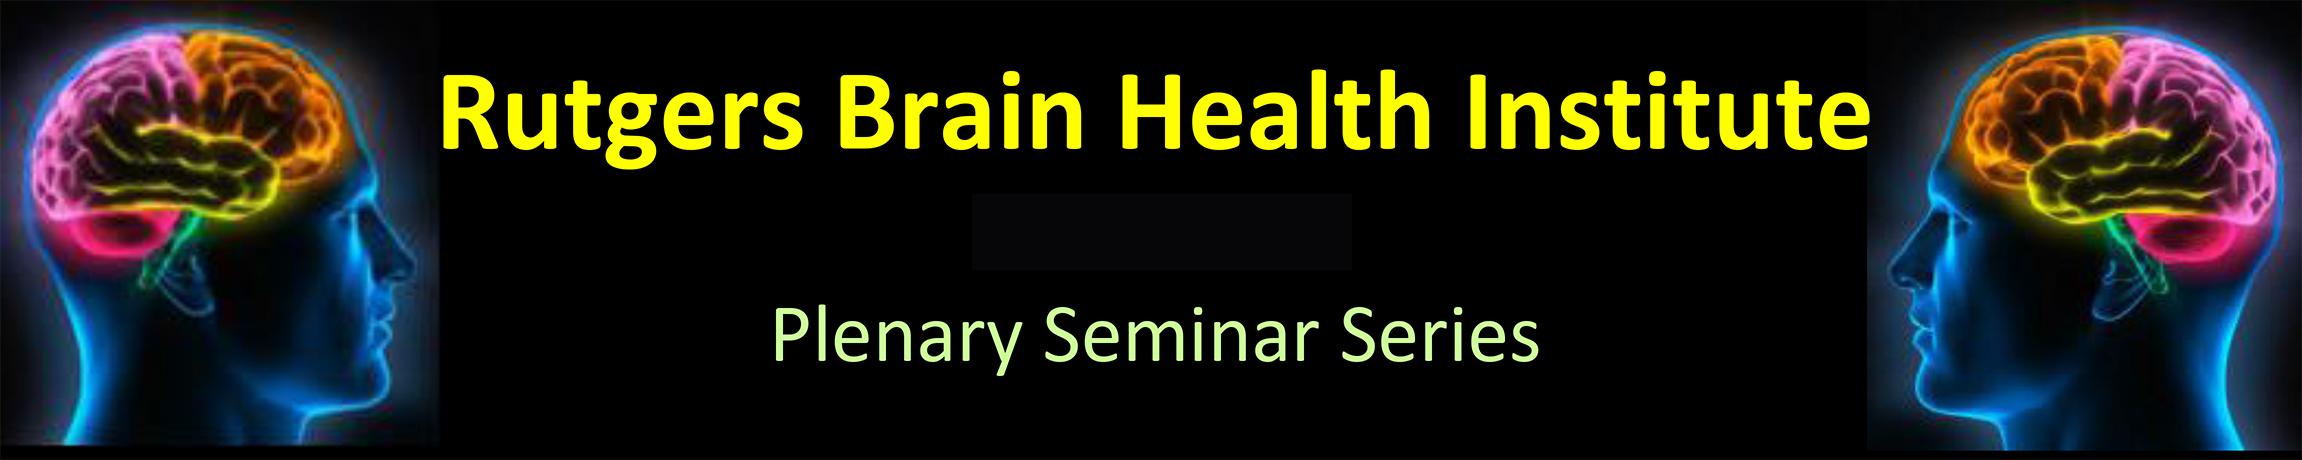 "<a href=""https://brainhealthinstitute.rutgers.edu/wp-content/uploads/2016/08/Seminar-Schdeule-Flyer.pdf"" target=""_blank""></a>"